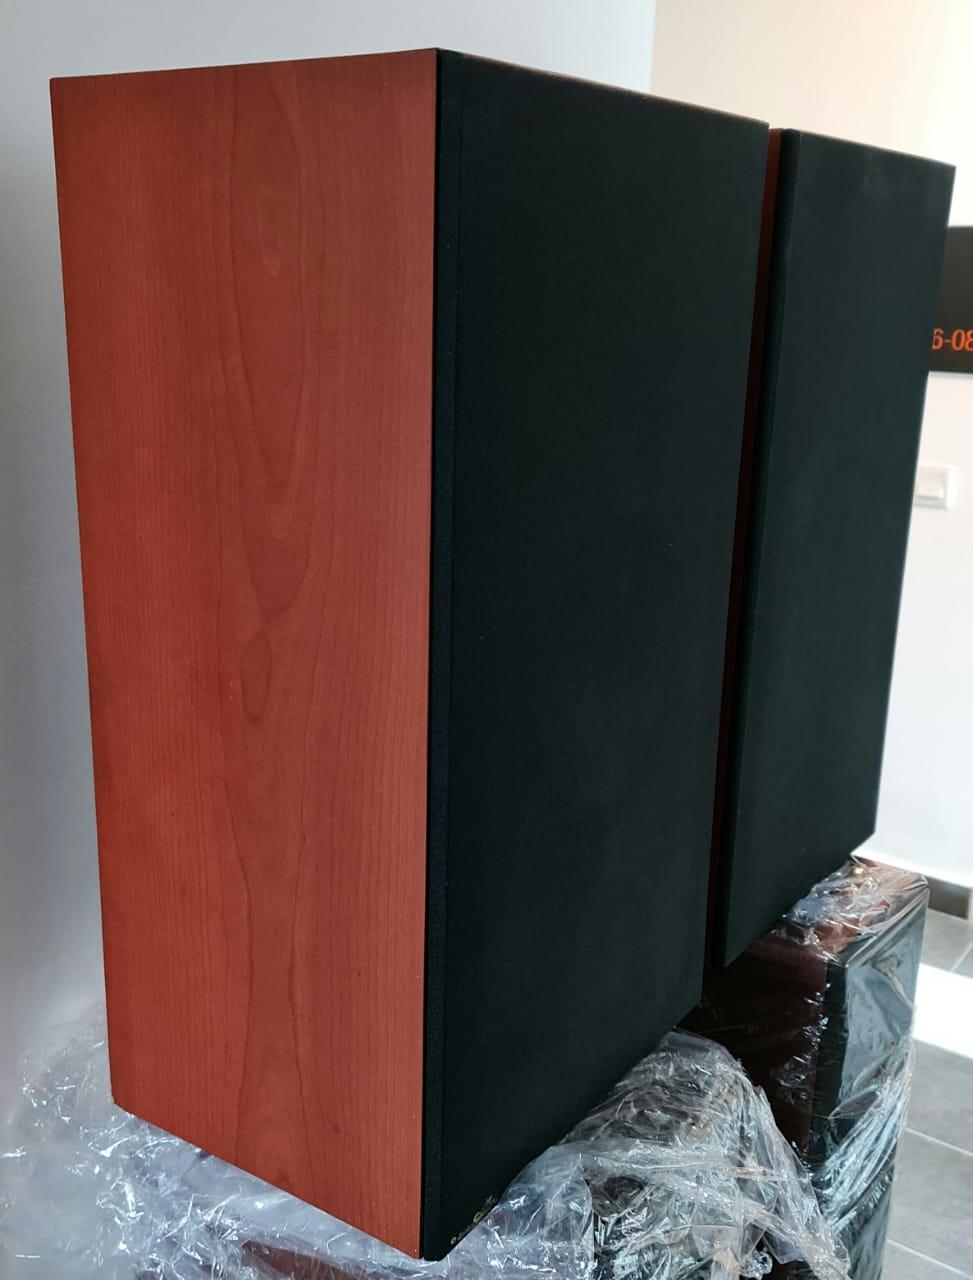 Audio Note AN-J/B Speakers Audion18